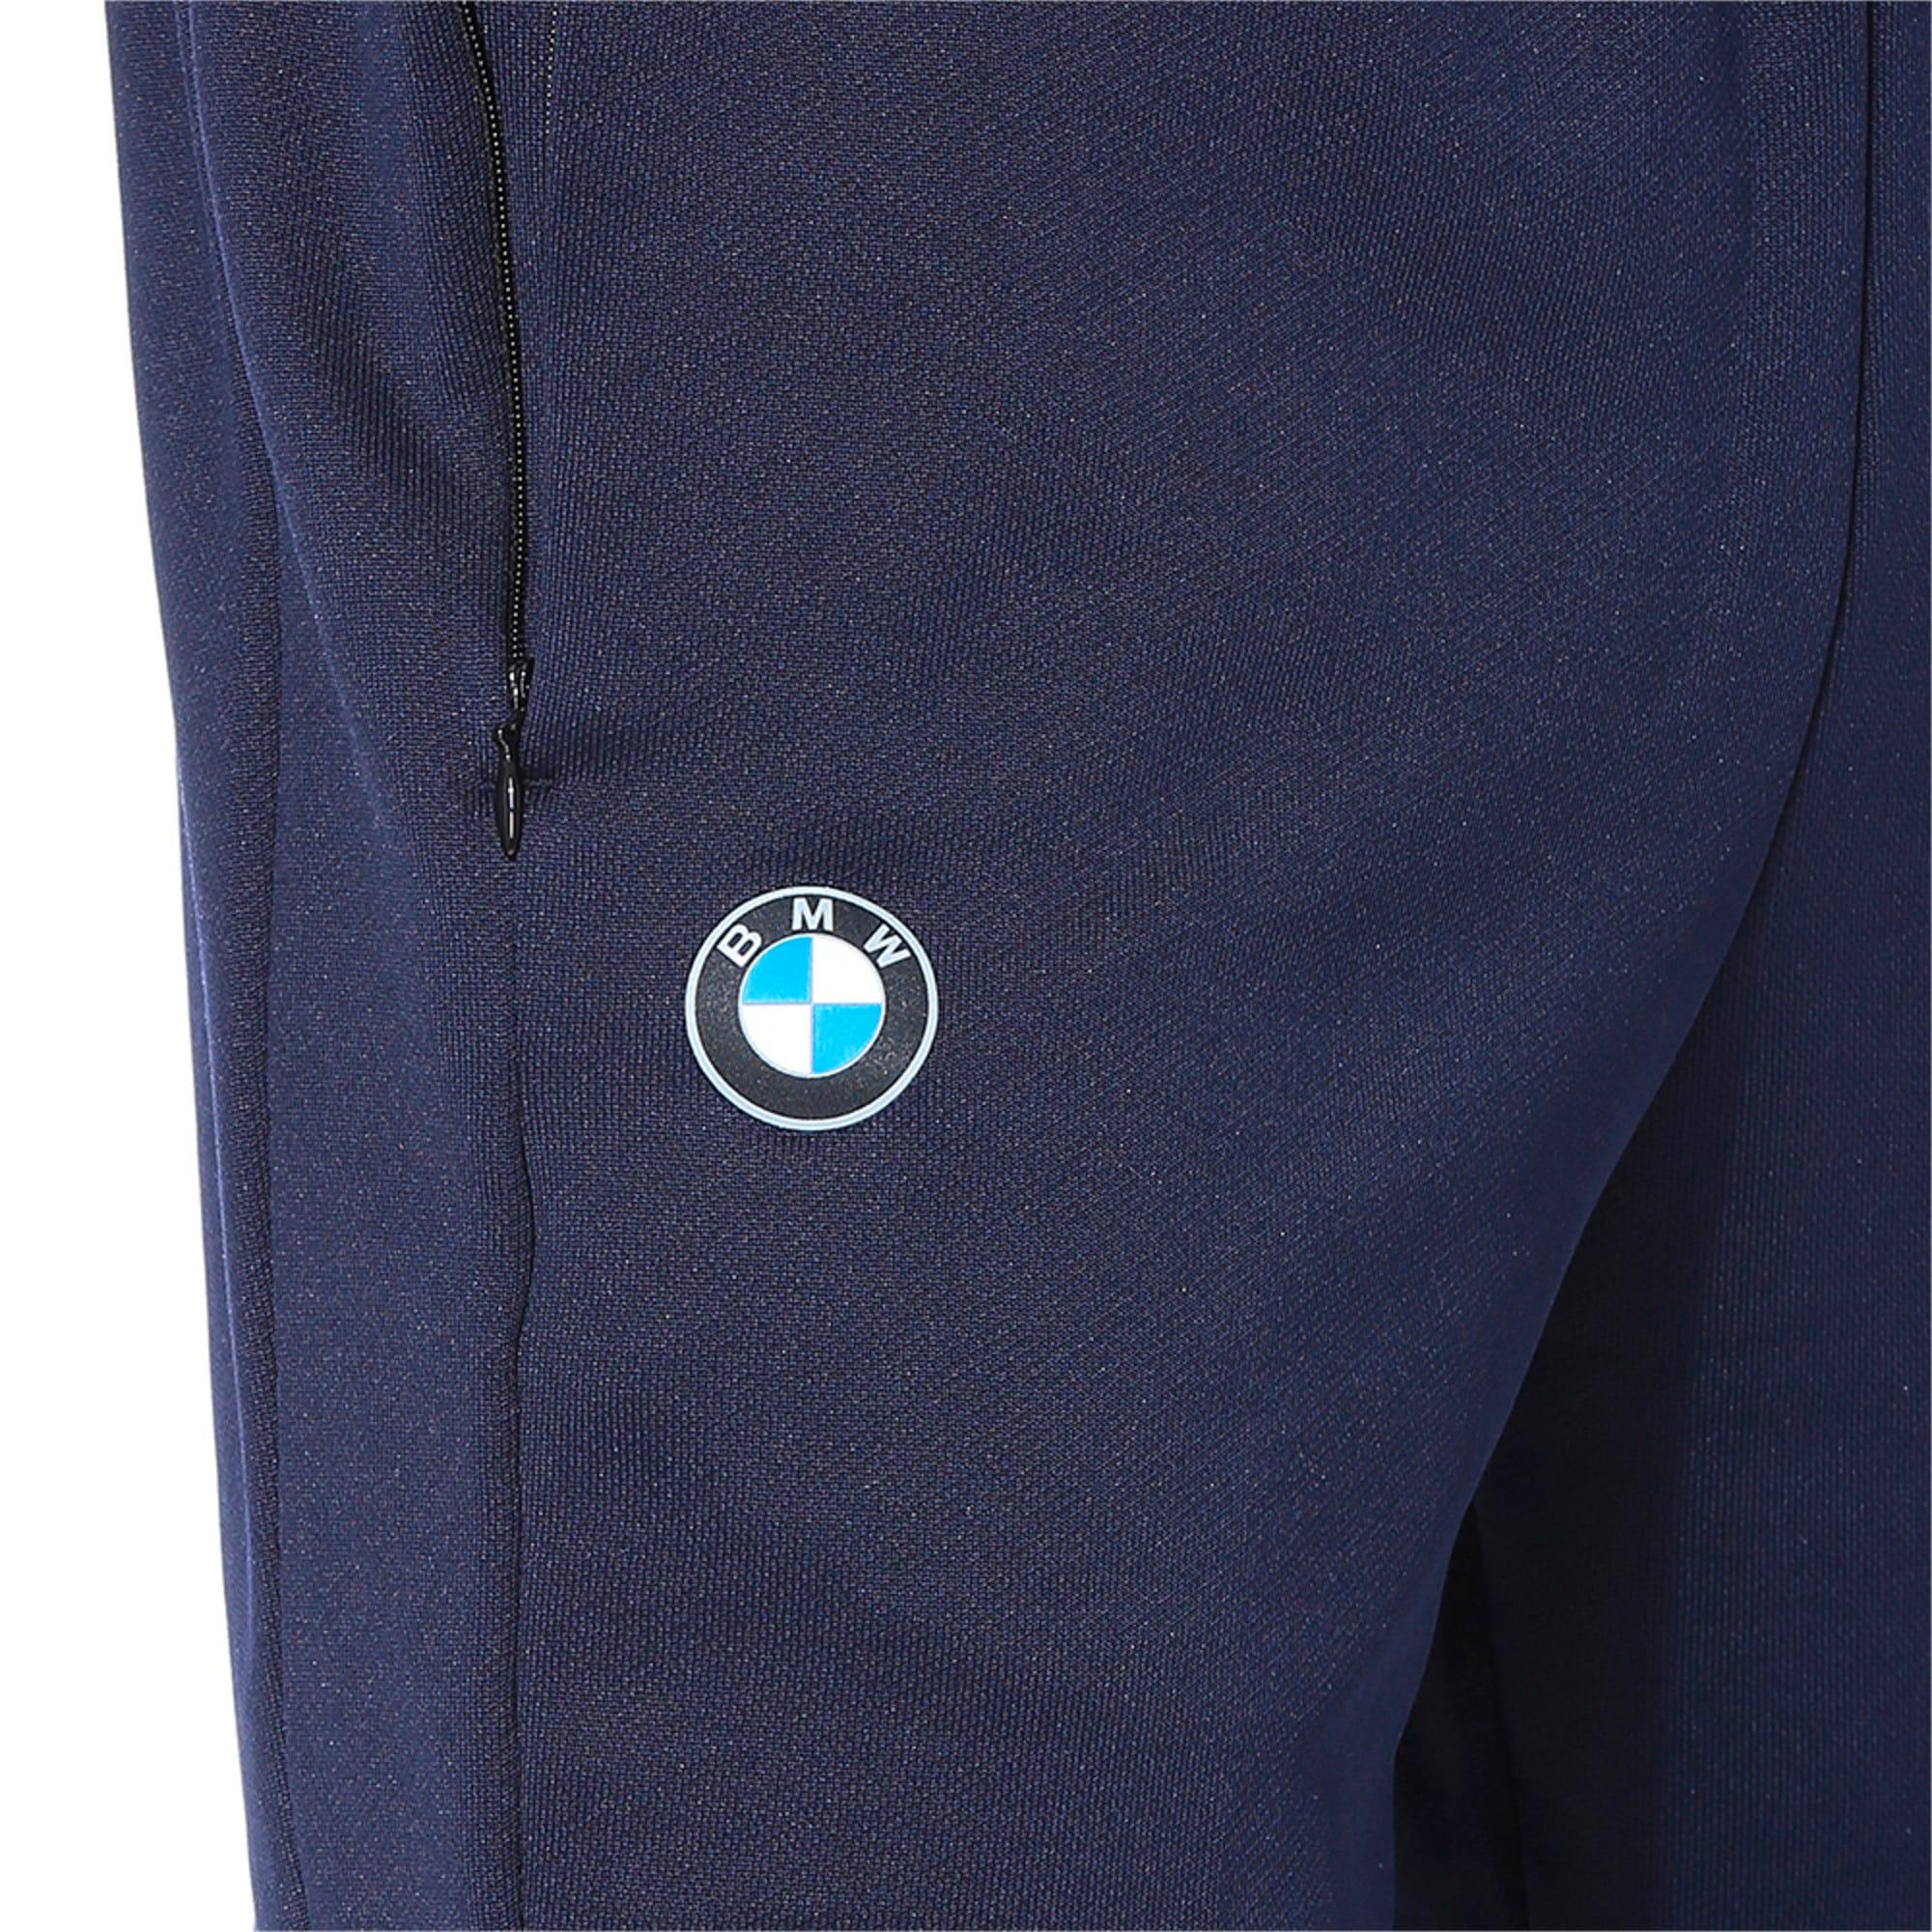 Thumbnail 6 of BMW M Motorsport Men's T7 Track Pants, Team Blue, medium-IND